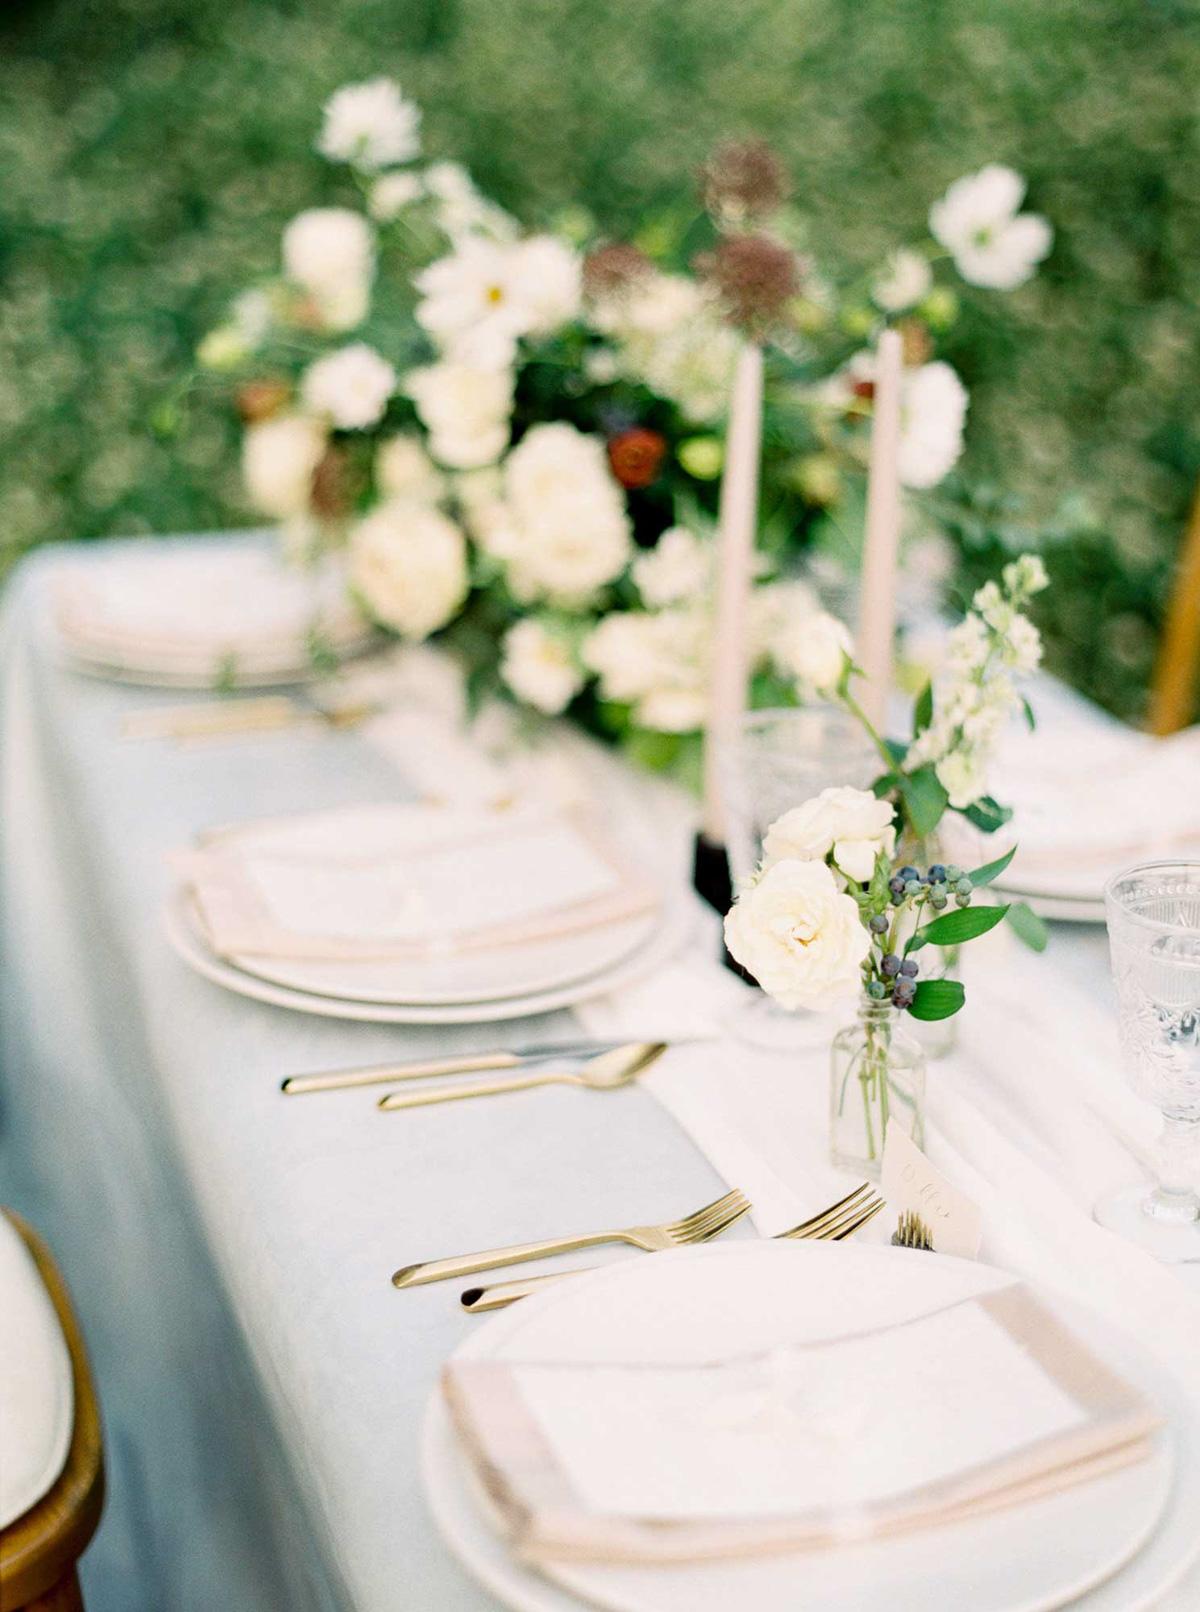 kayla-yestal-vineyard-bride-swish-list-woodland-weddings-niagara-wedding-editorial-68.jpg